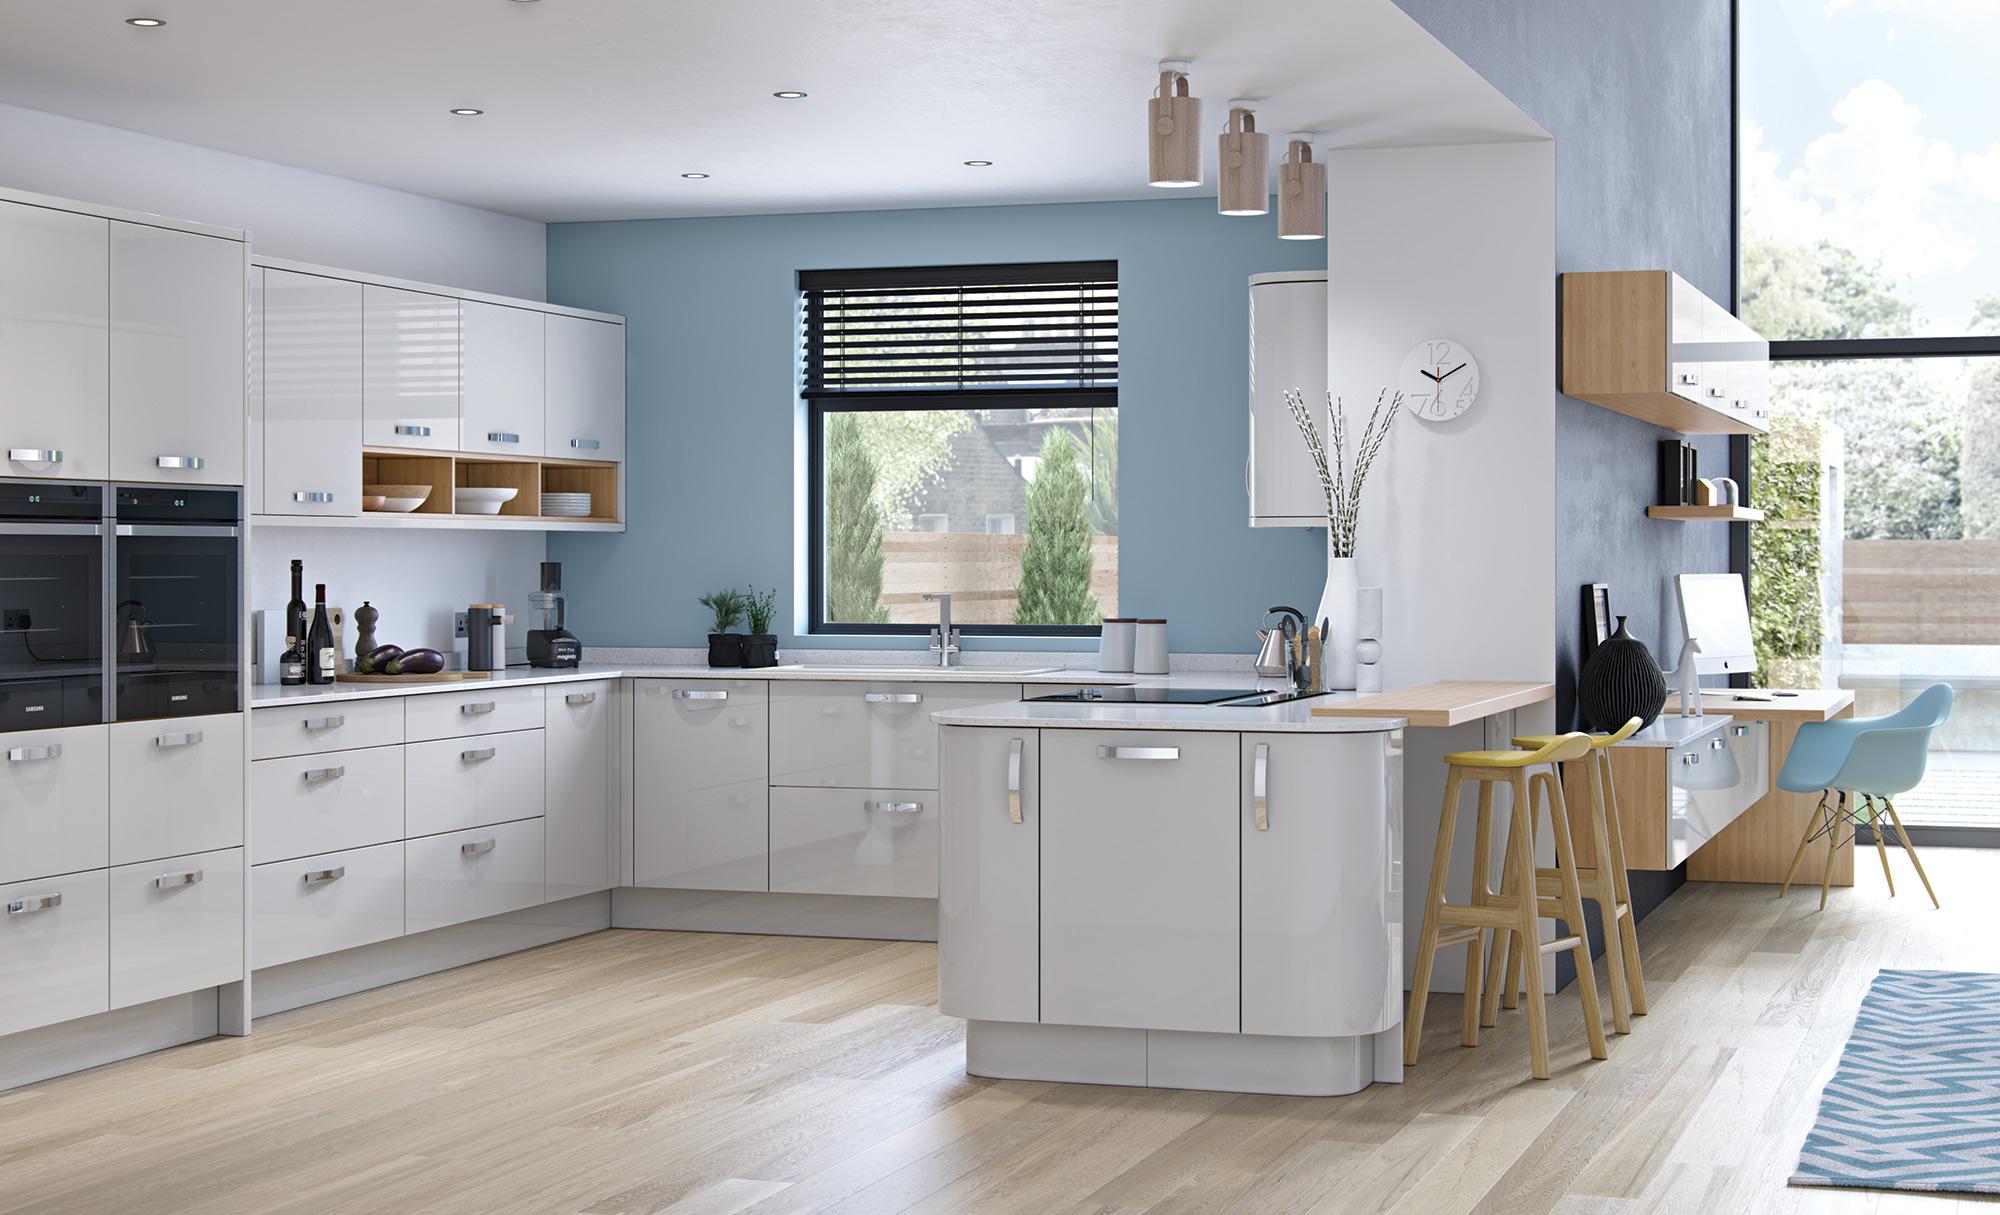 Modern Contemporary Kitchen - Zola Gloss Light Grey Kitchen - Kitchen Design - Alan Kelly Kitchens - Waterford